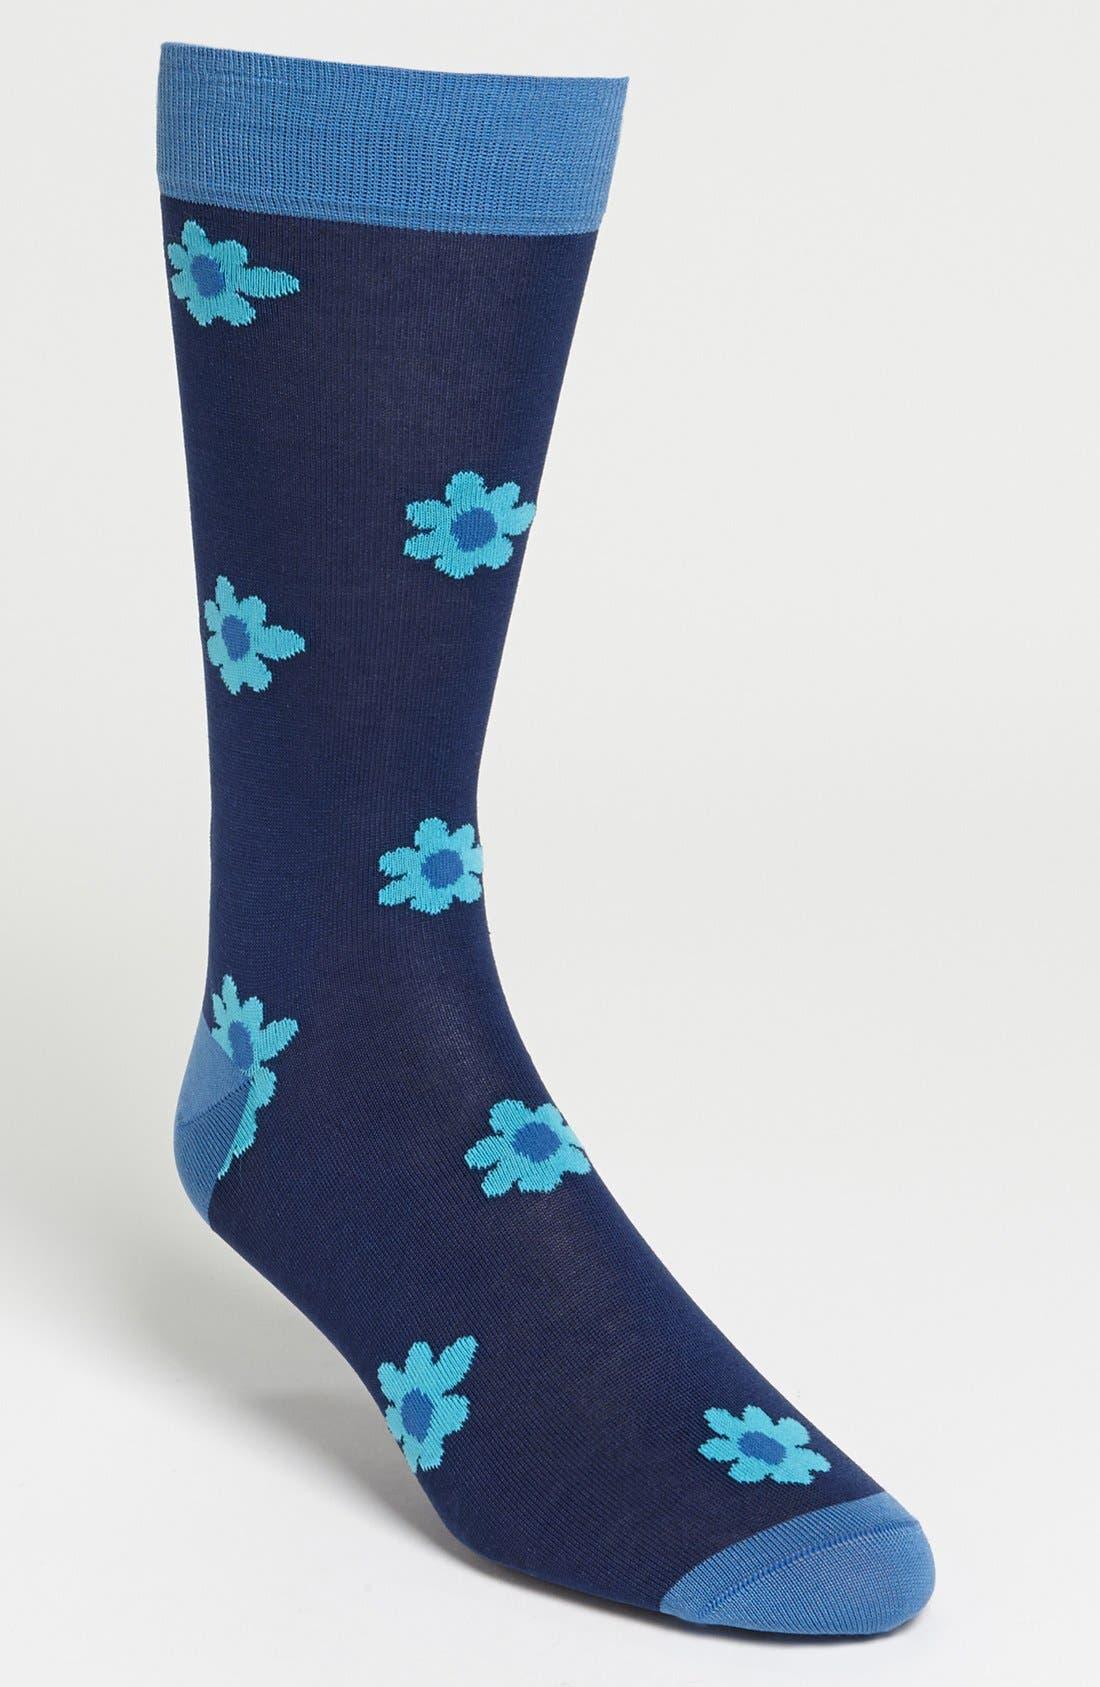 Alternate Image 1 Selected - Marcoliani 'Hibiscus' Socks